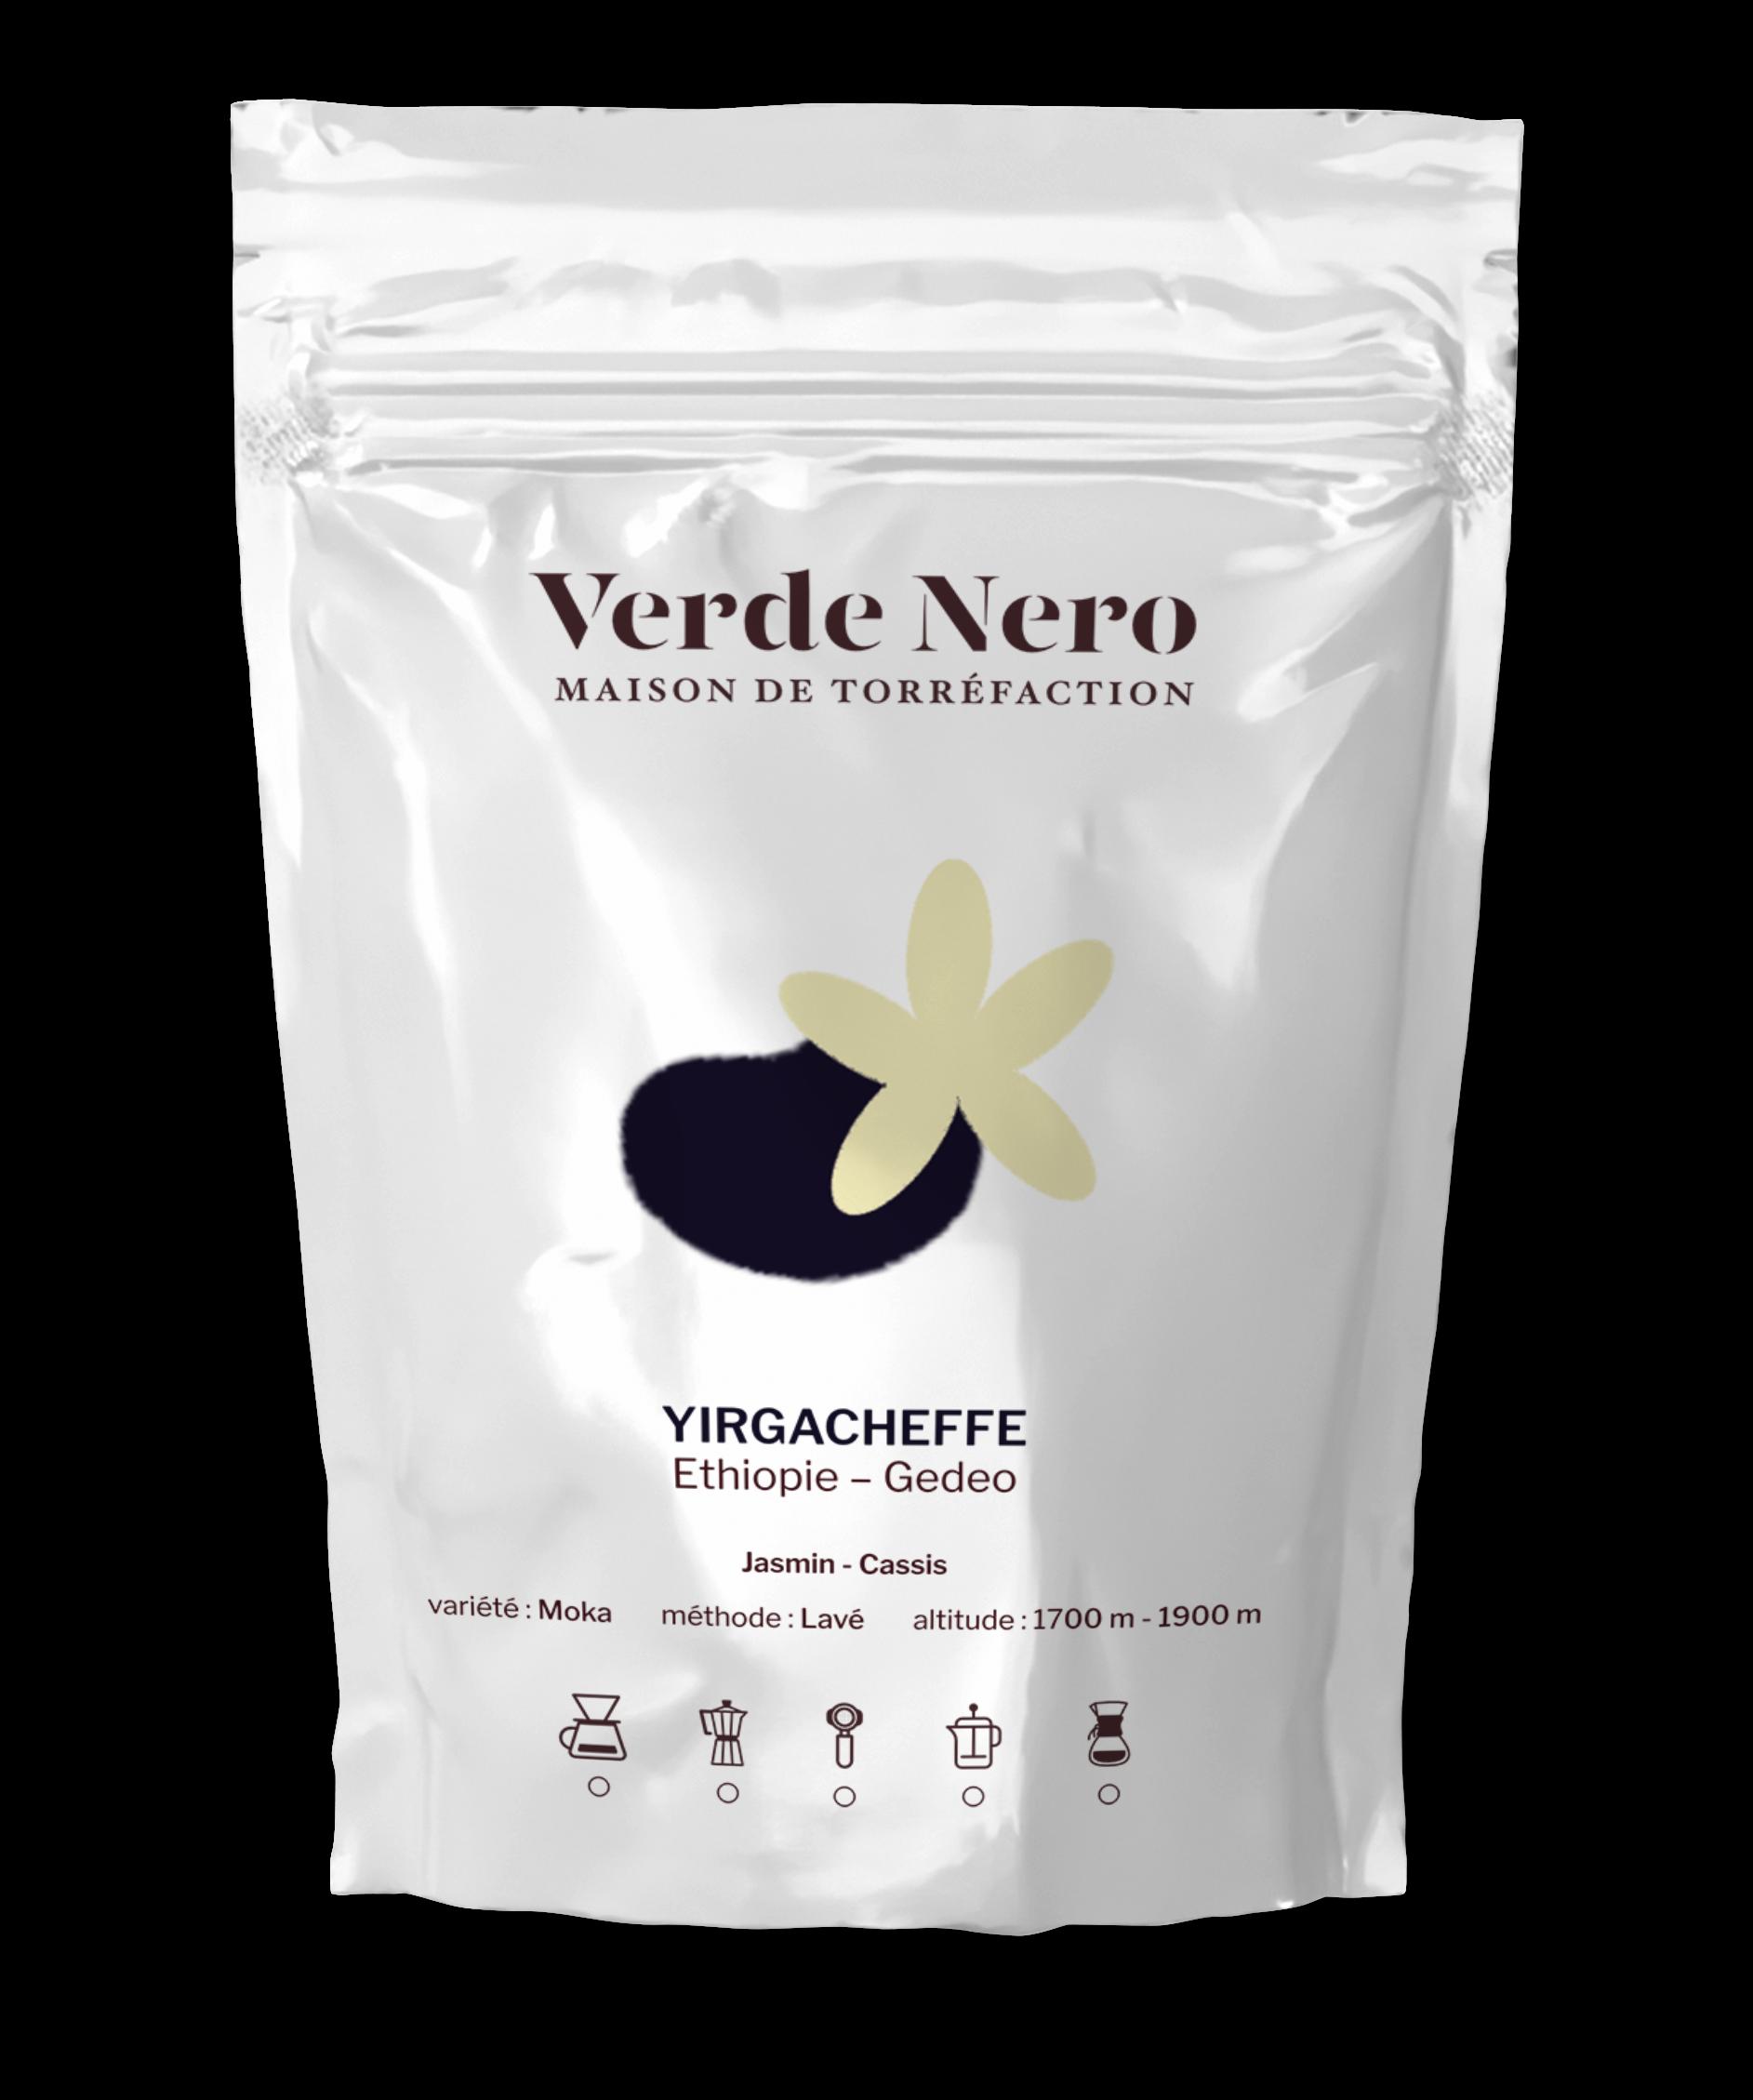 Verde Nero Café - Yirgacheffe